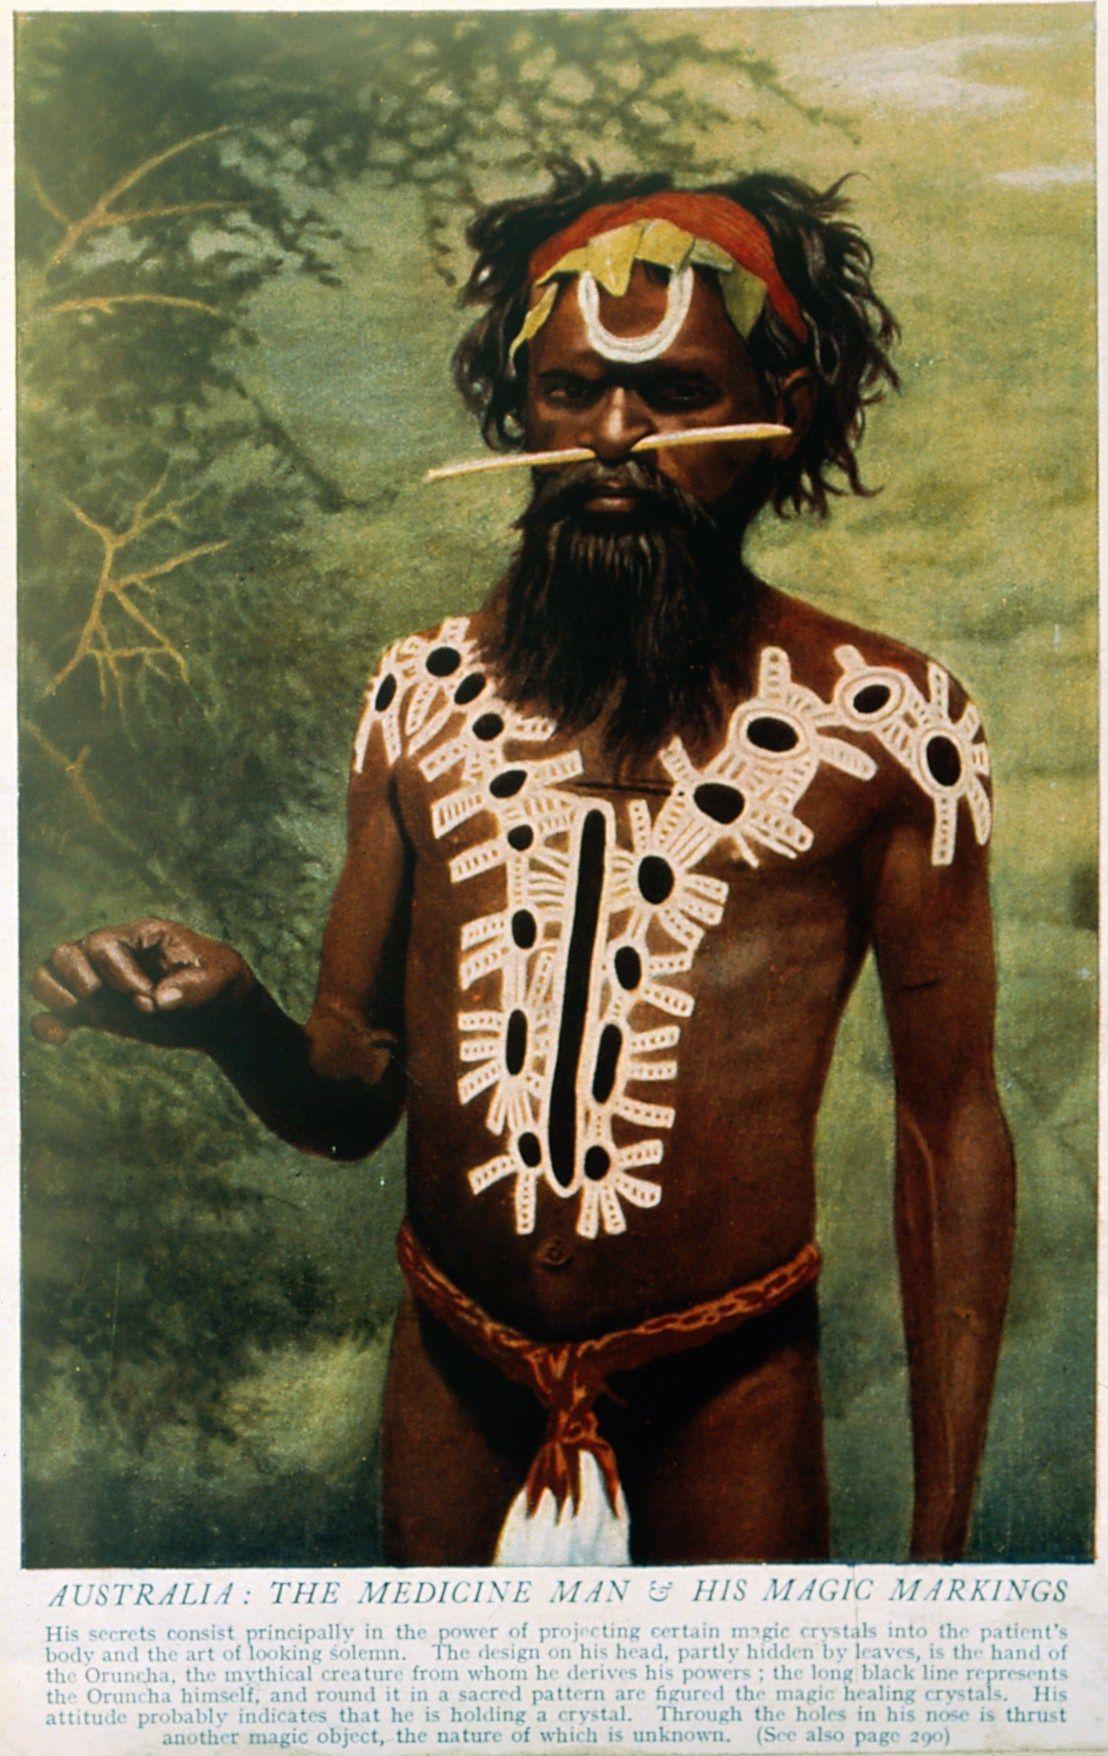 Shaman/medicine man, body paint, Australia